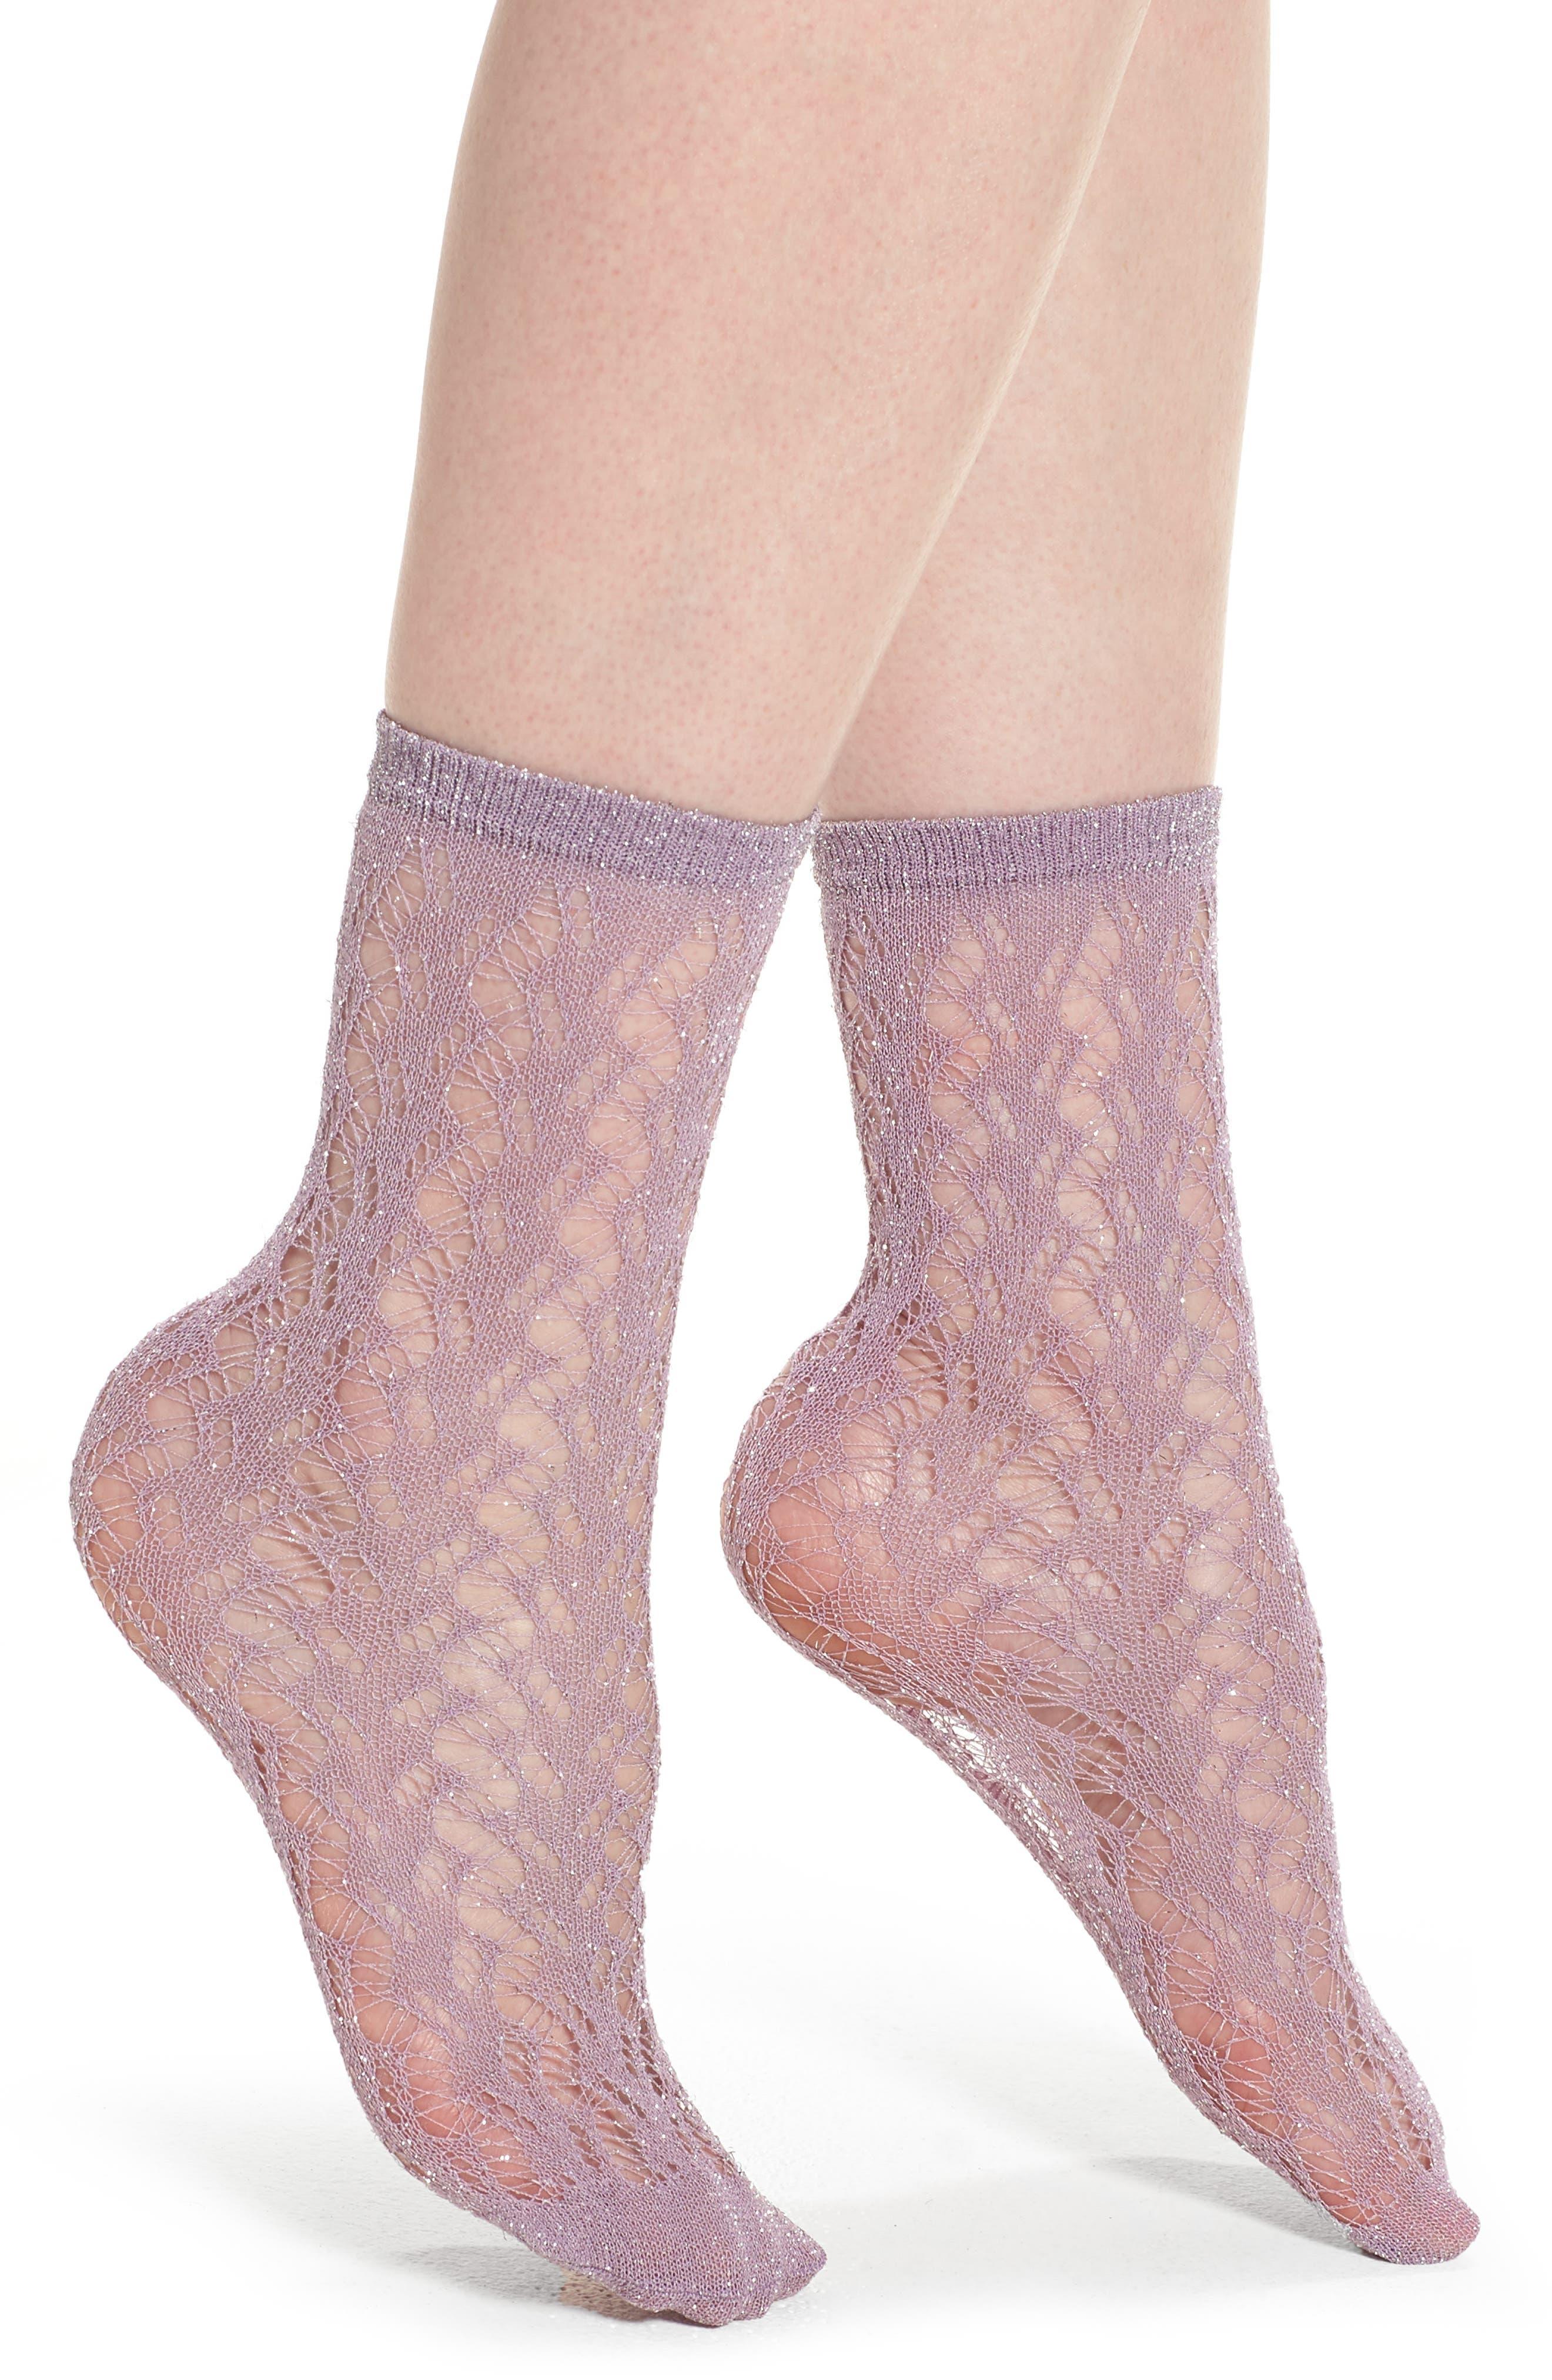 Oroblu Calzino Glitter Fishnet Trouser Socks